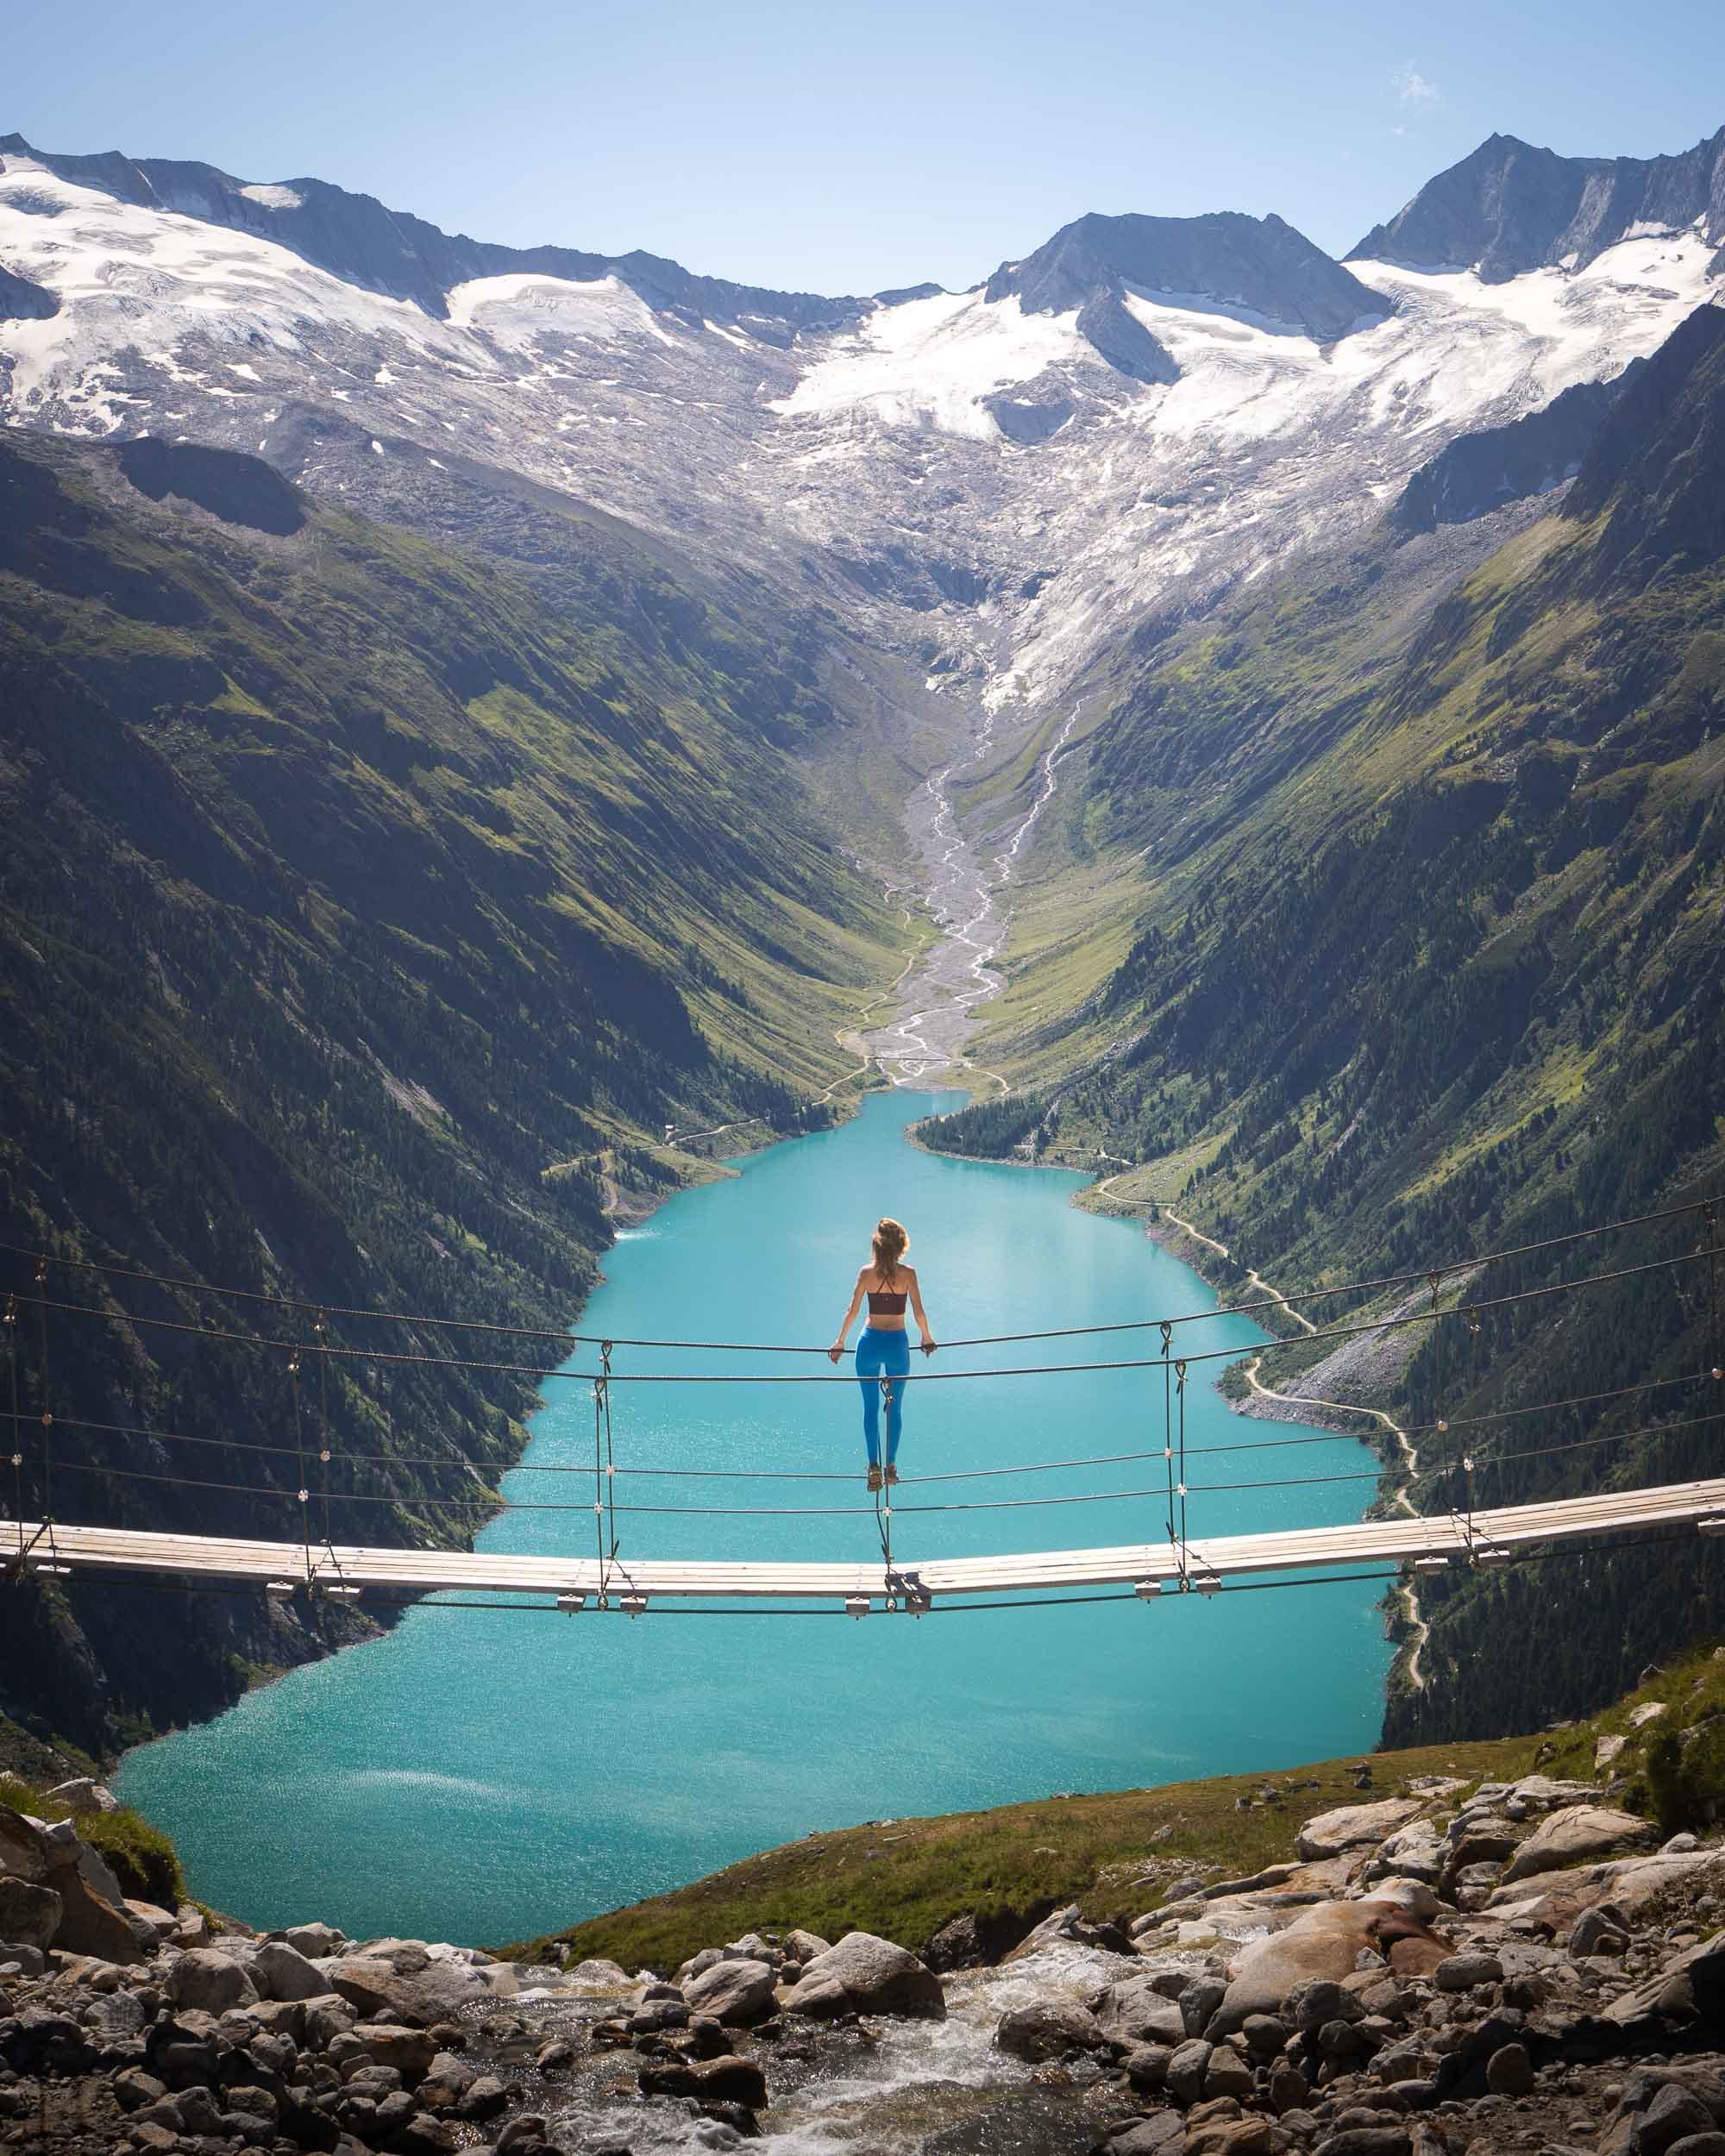 Bridge at Olperer Mountain Hutte in Austria